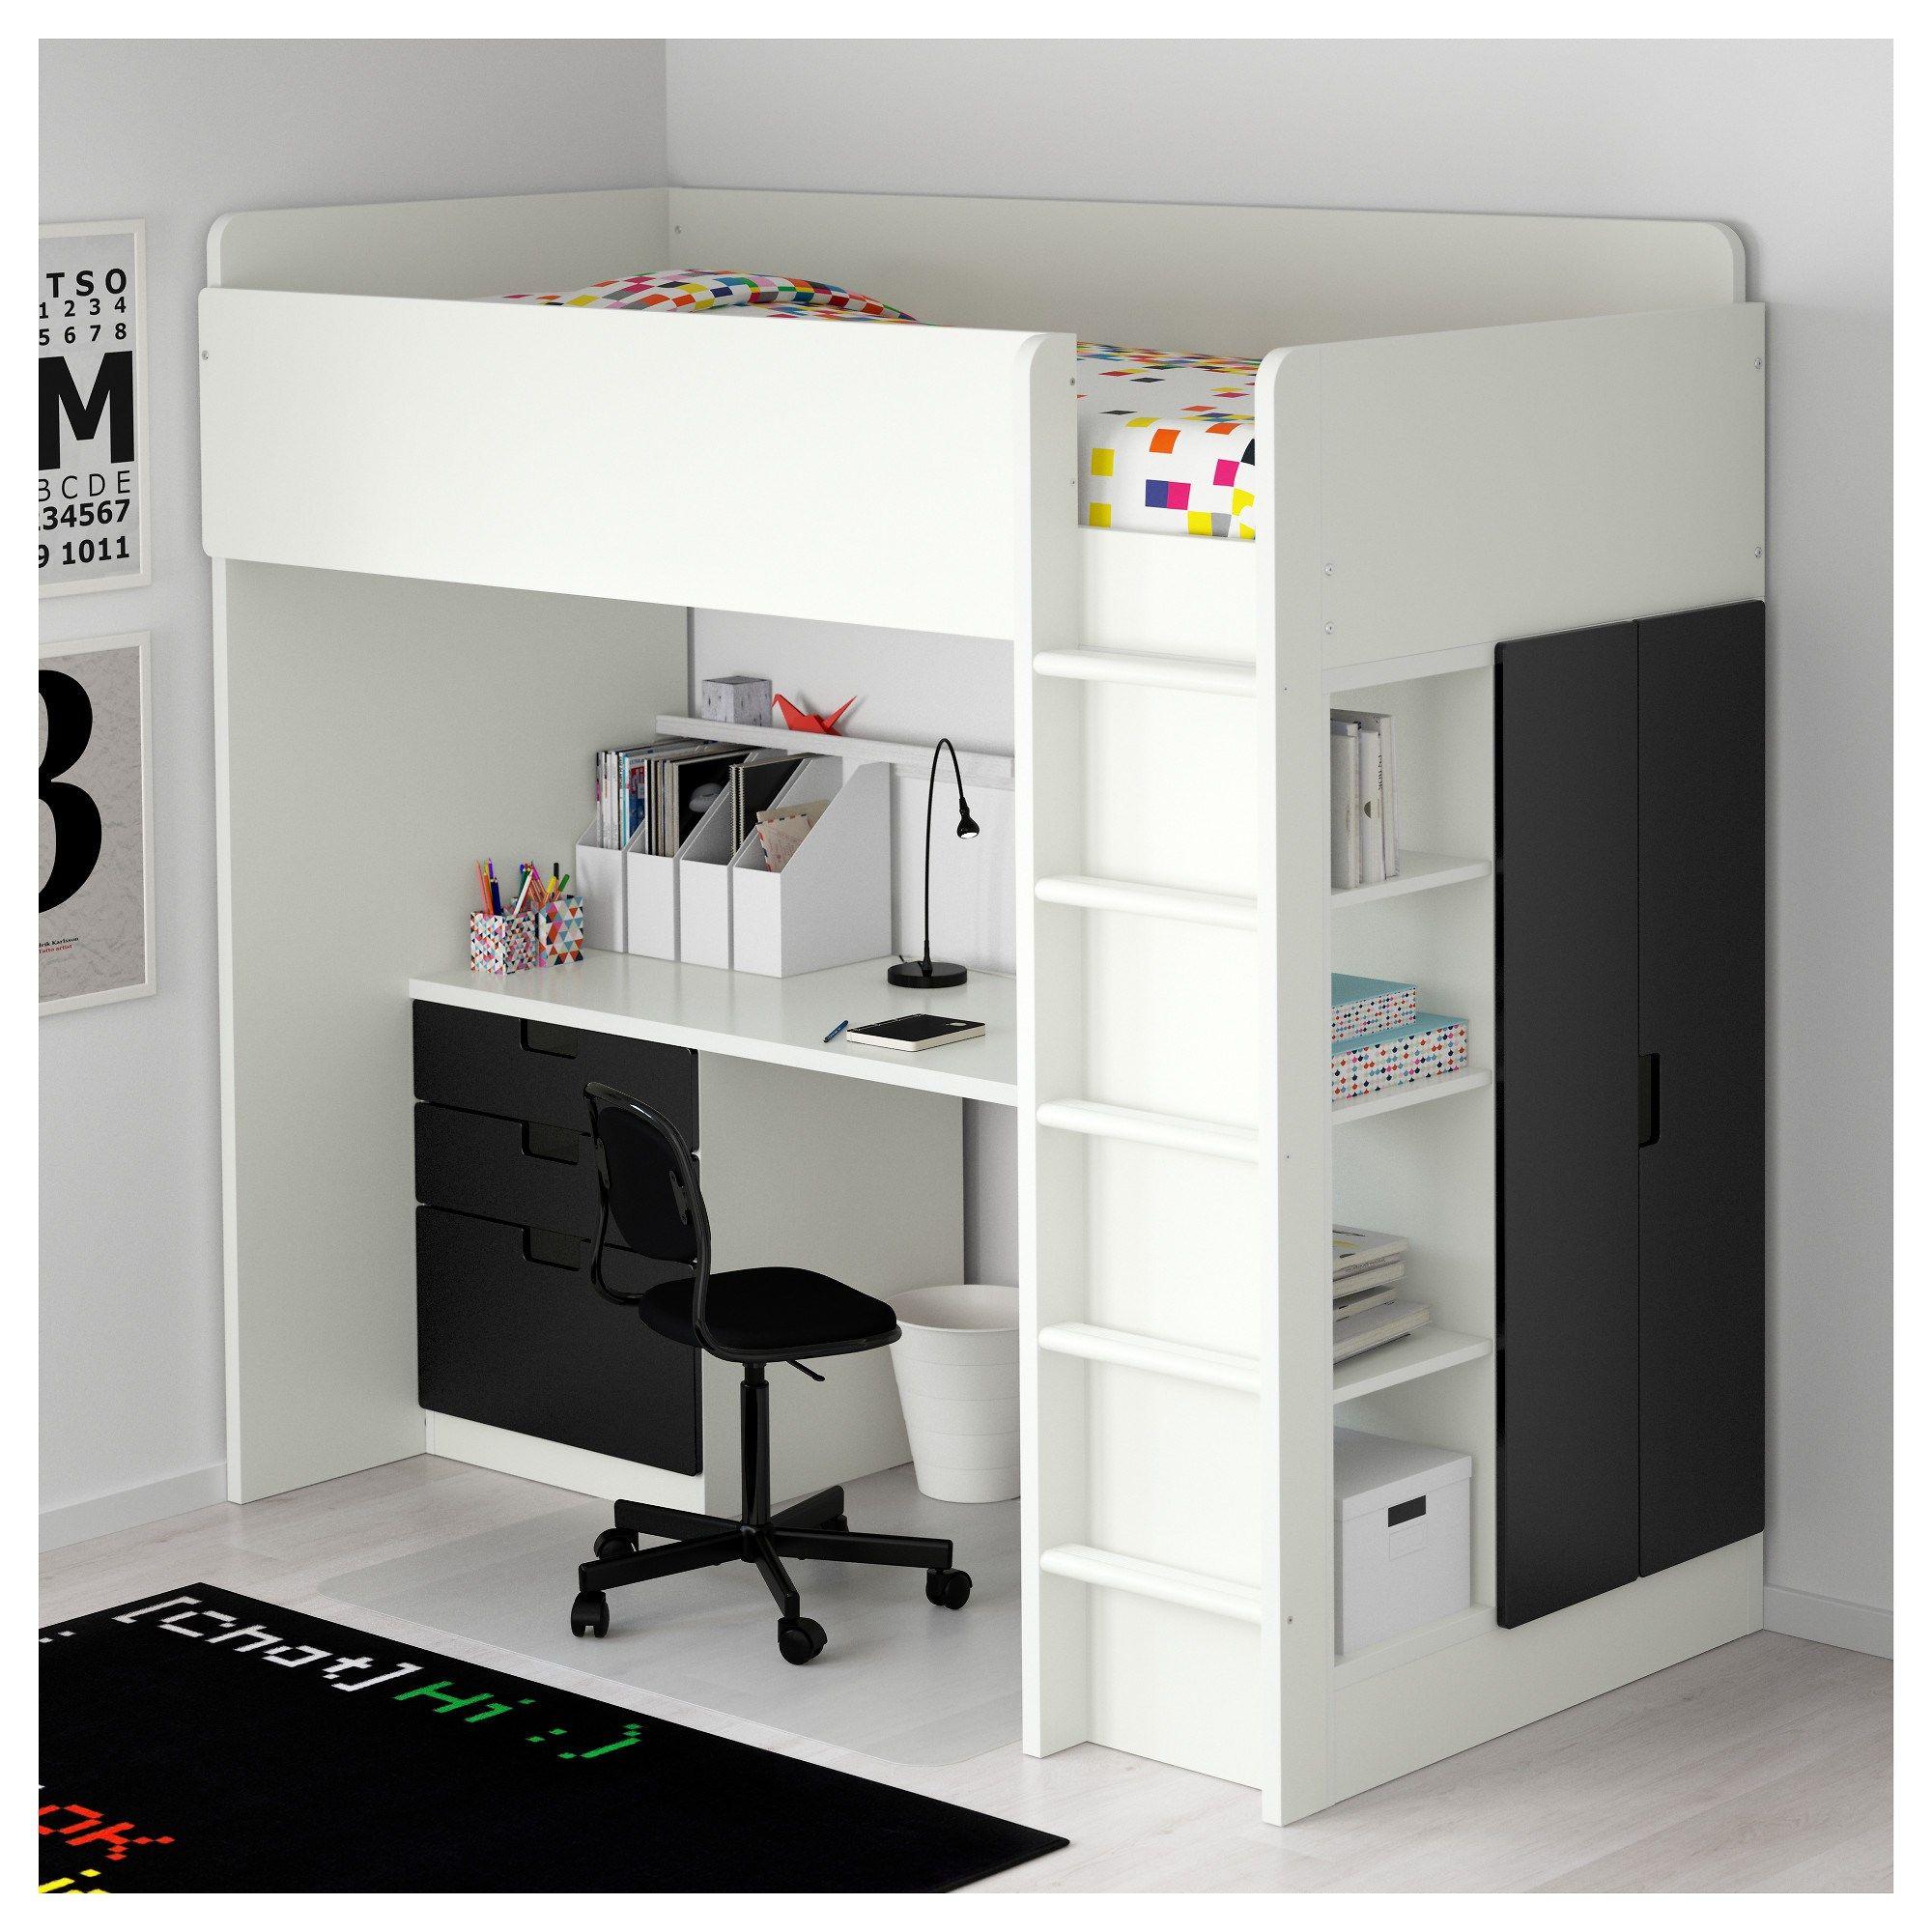 Girls loft bed with stairs  PEg   bunkbeds  Pinterest  Loft bed desk